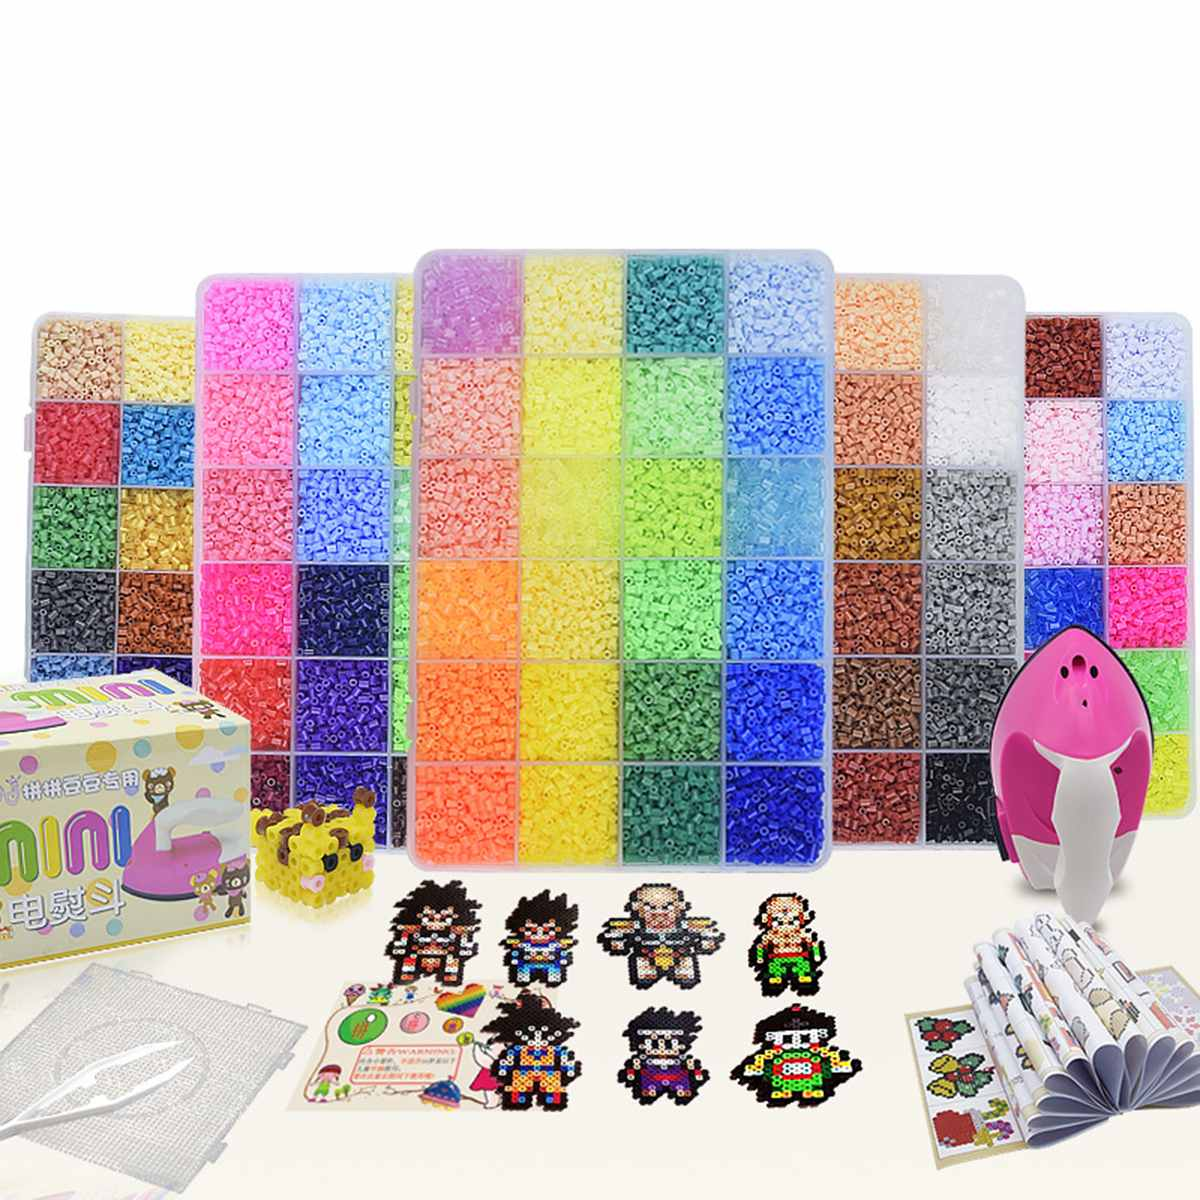 8000pcs 2.6mm EVA Hama Perler Beads Set Toy Kids Fun Craft DIY Handmaking Fuse Bead Multicolor Intelligence Educational Toys